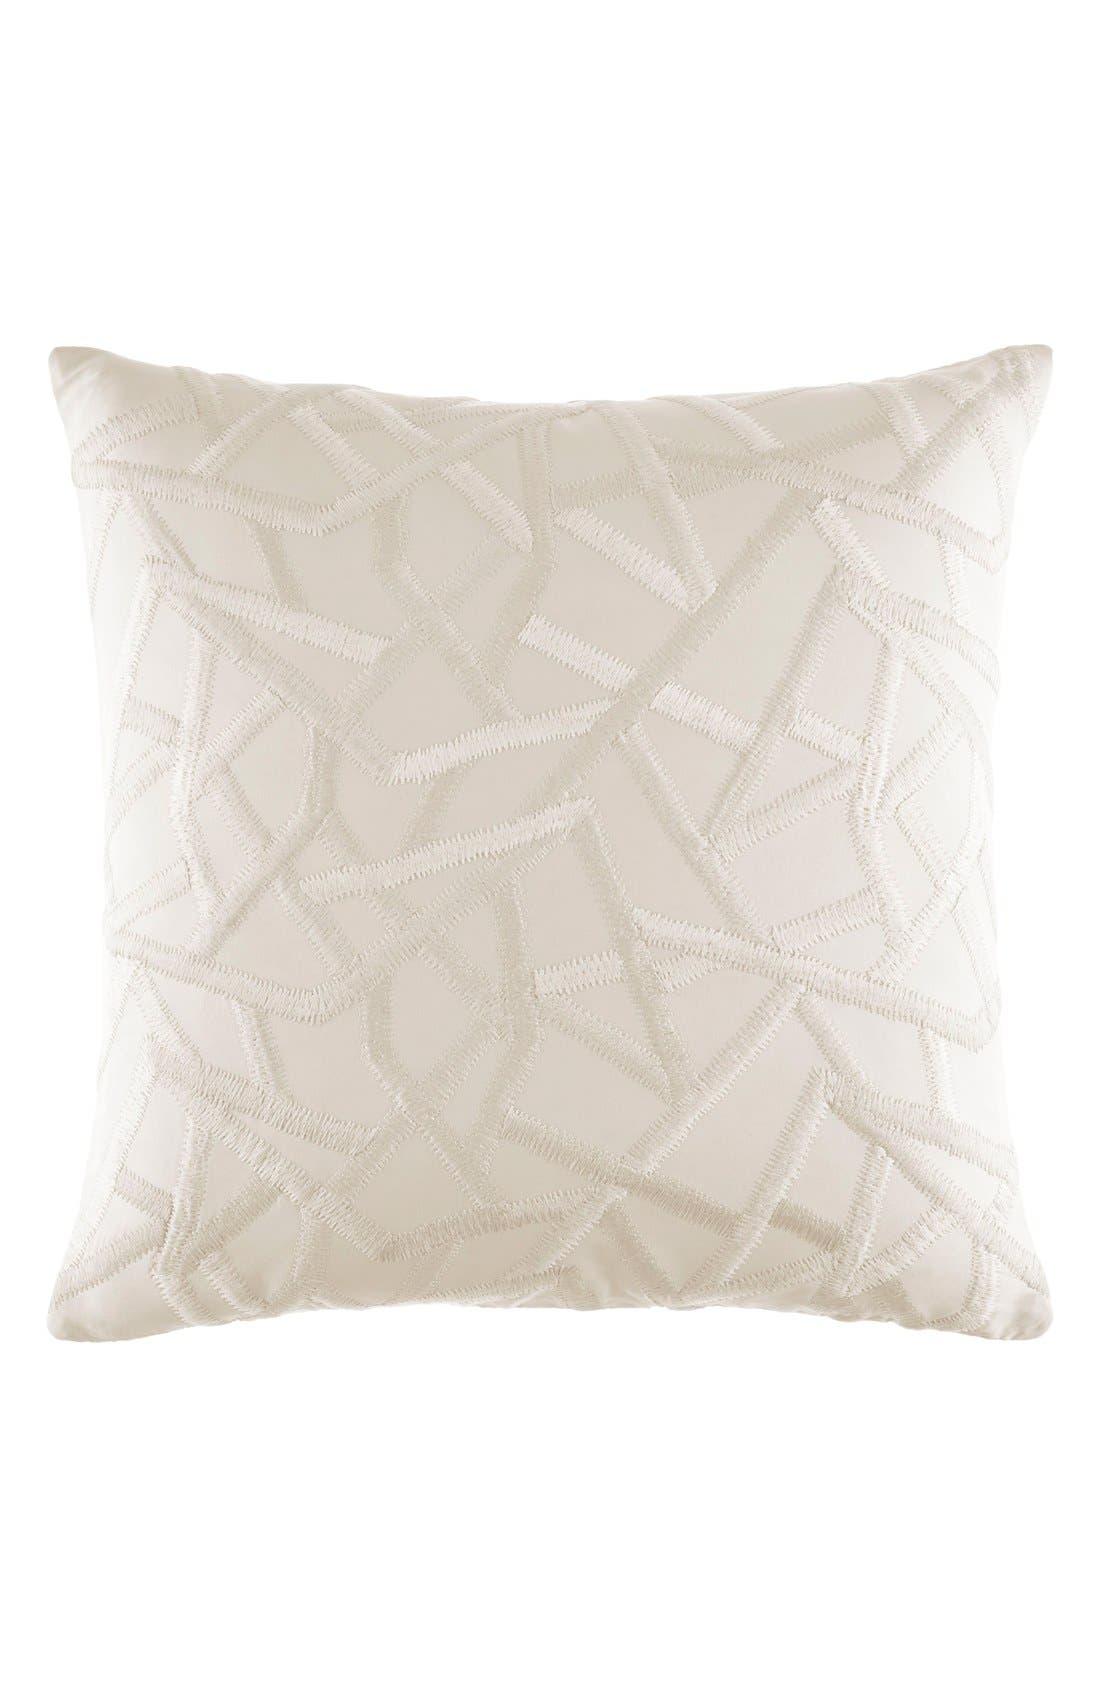 Alternate Image 1 Selected - Catherine Malandrino 'Optic' Pillow